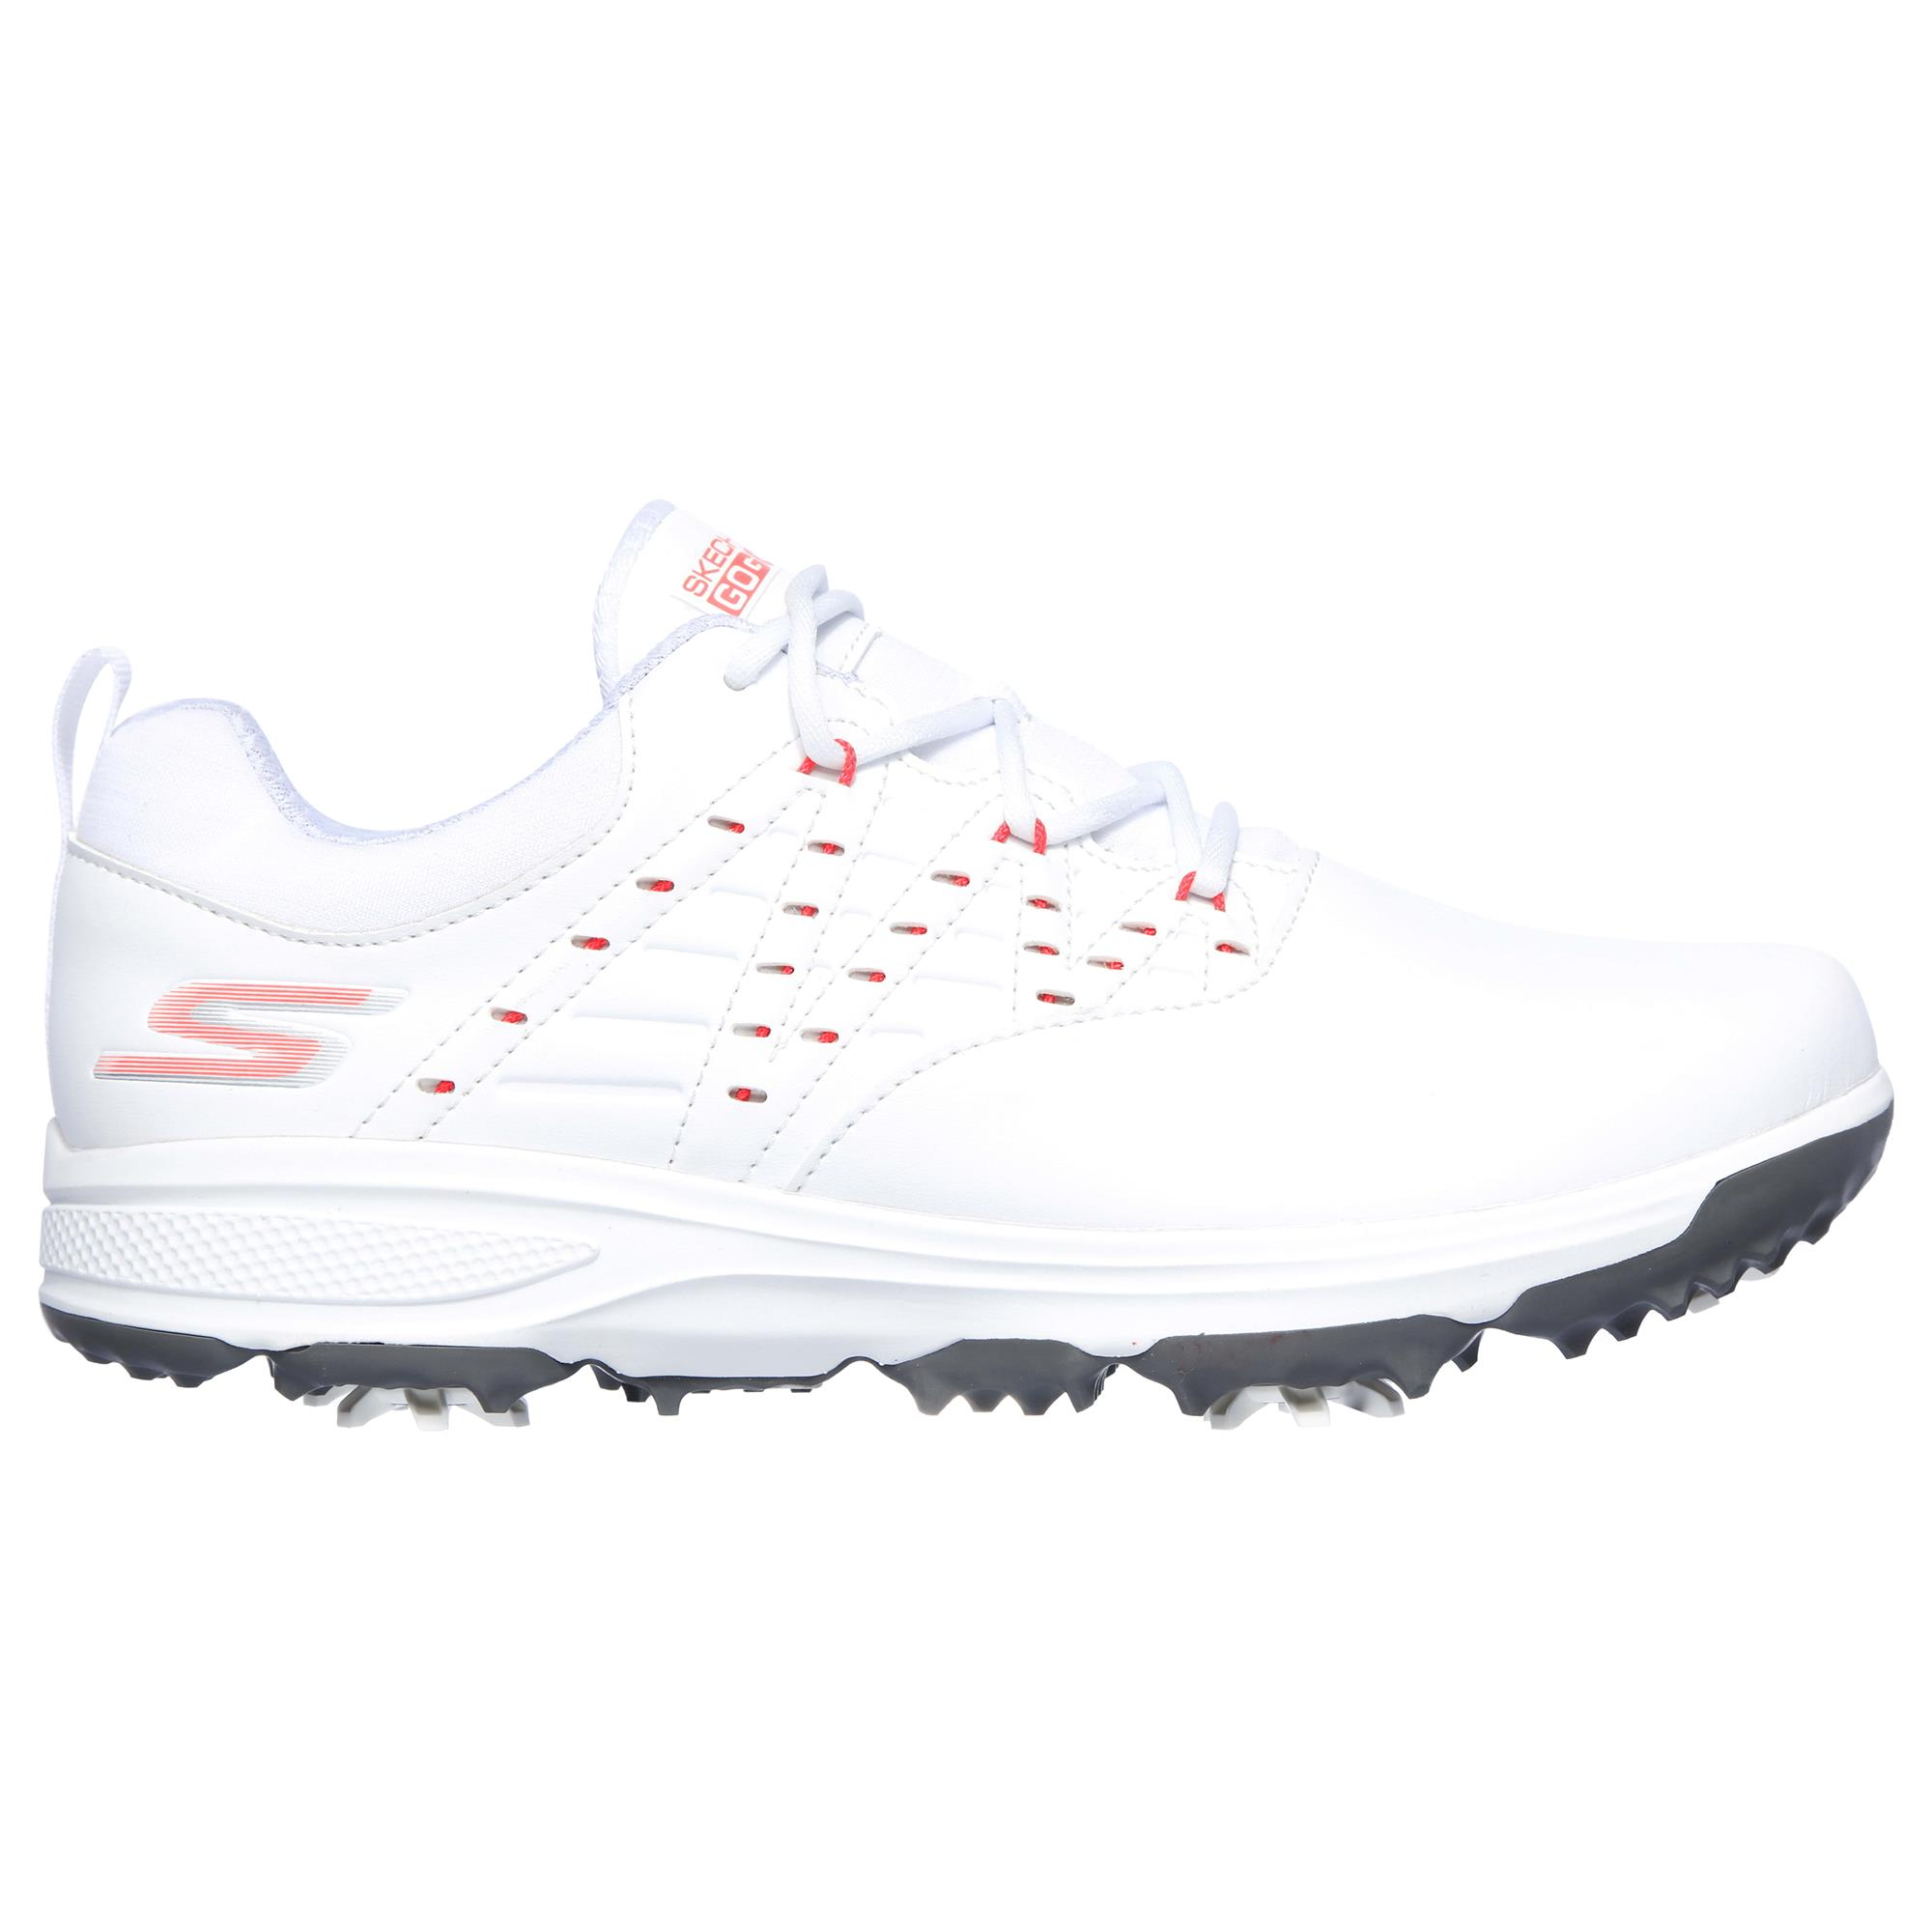 Skechers Pro 2 Ladies Golf Shoes White